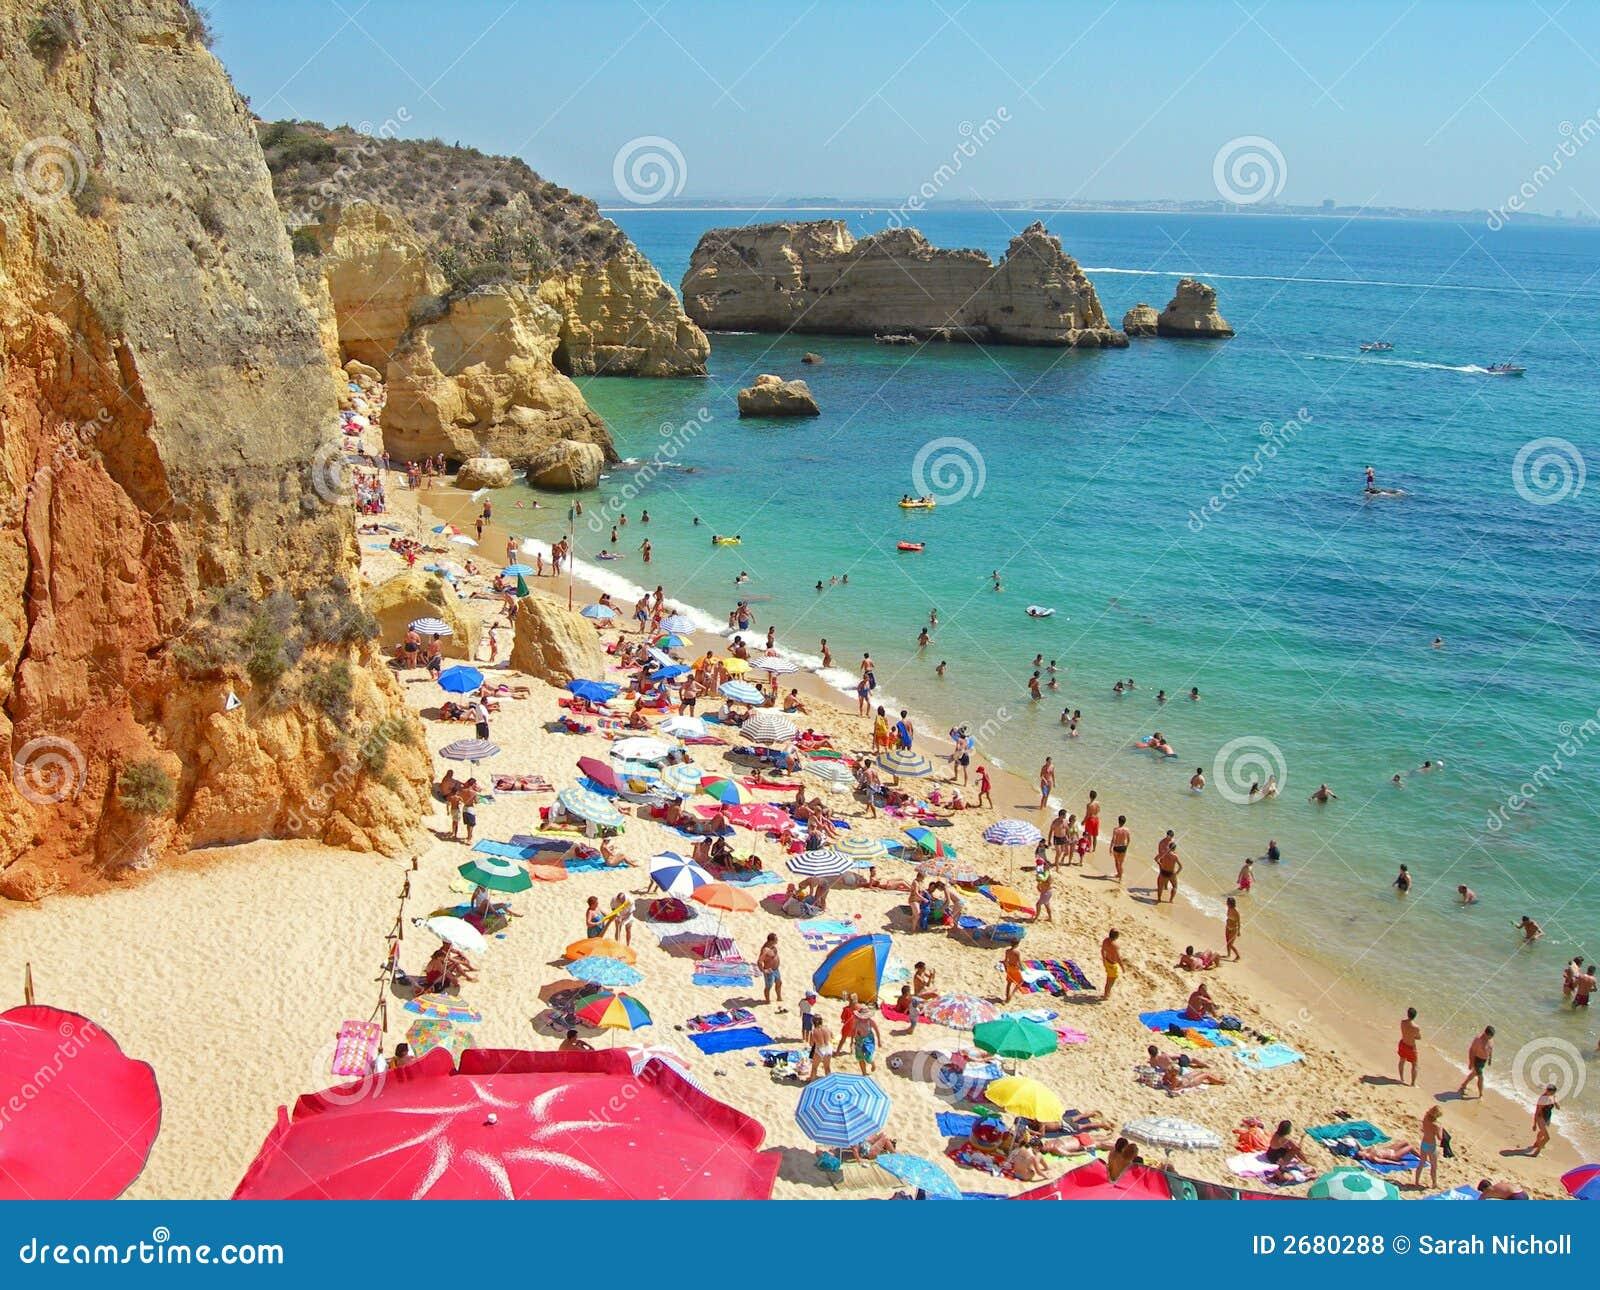 Expansive Colourful Beach Royalty Free Stock Photos ... - photo#18